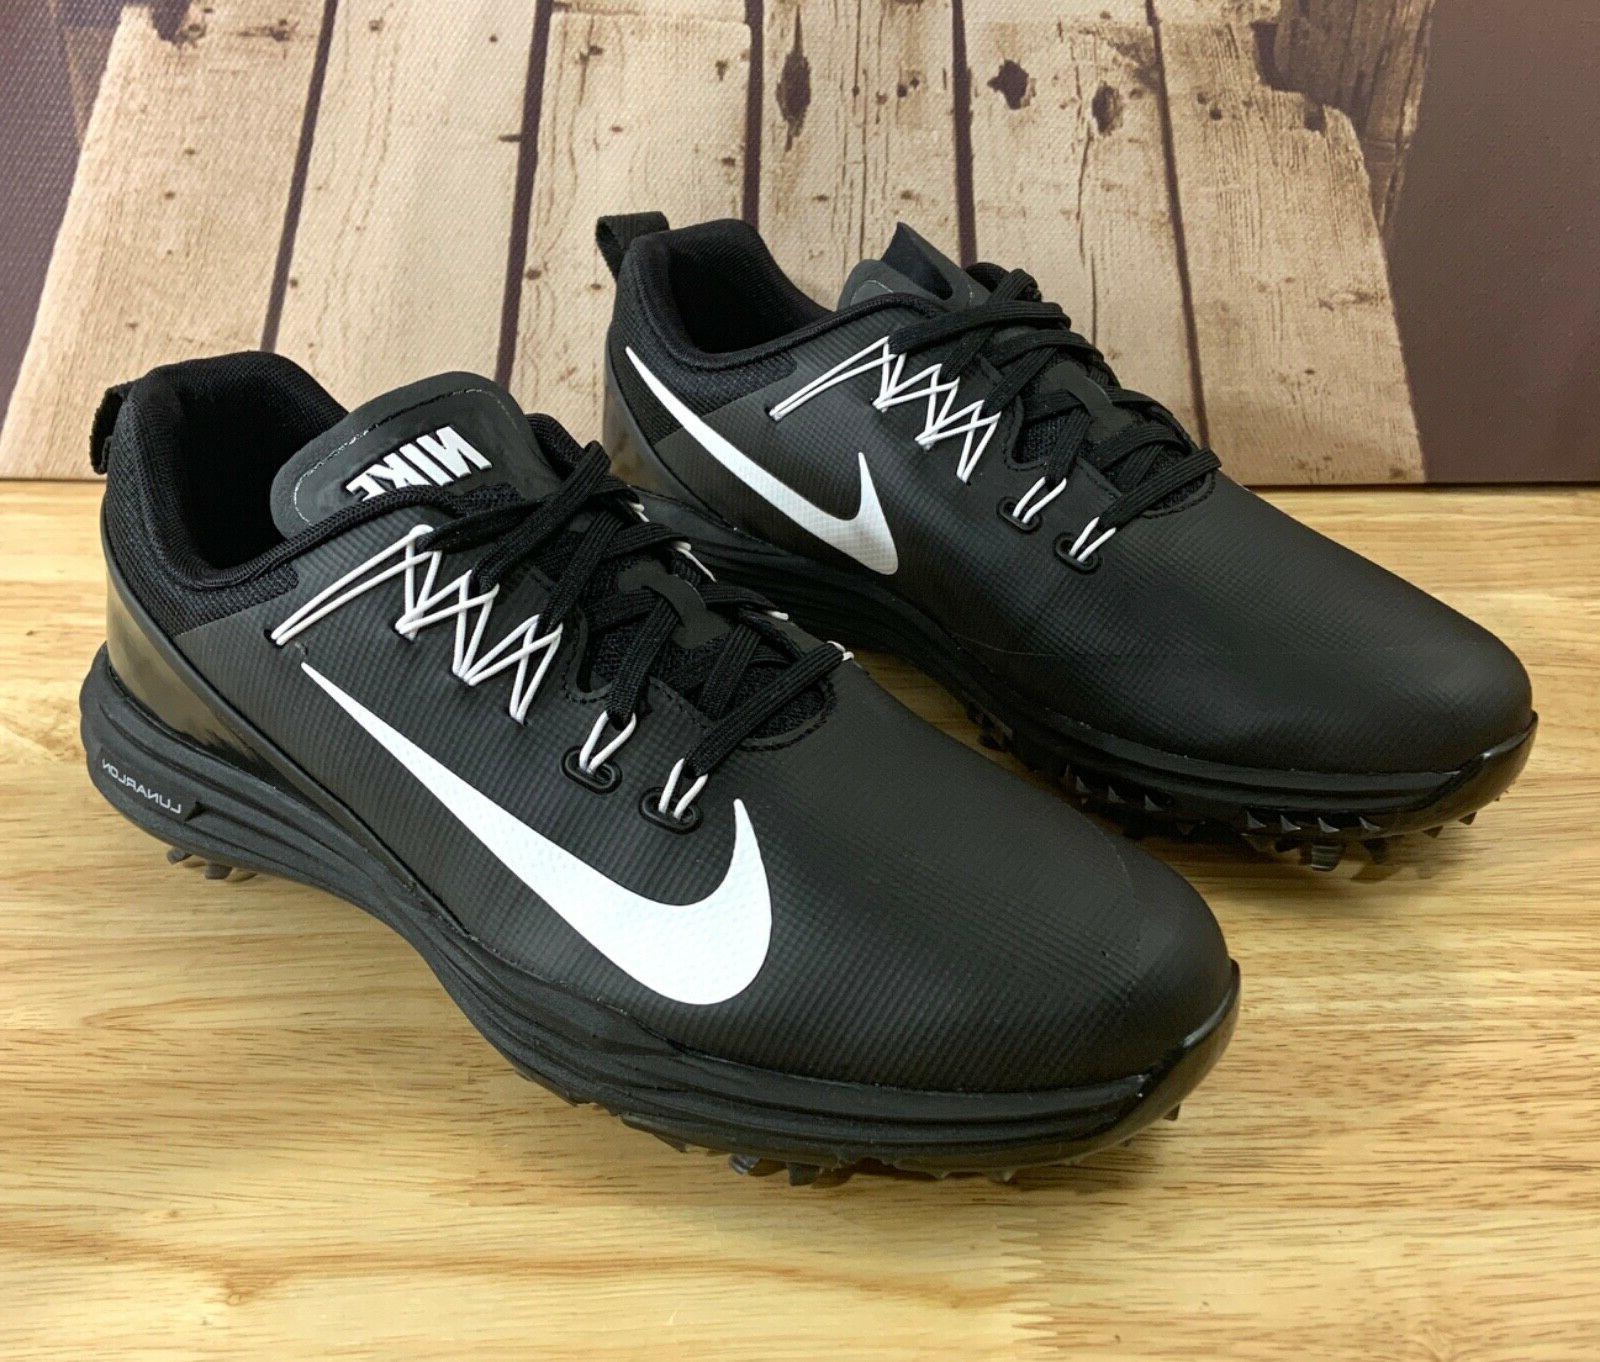 women s lunar command 2 golf shoes